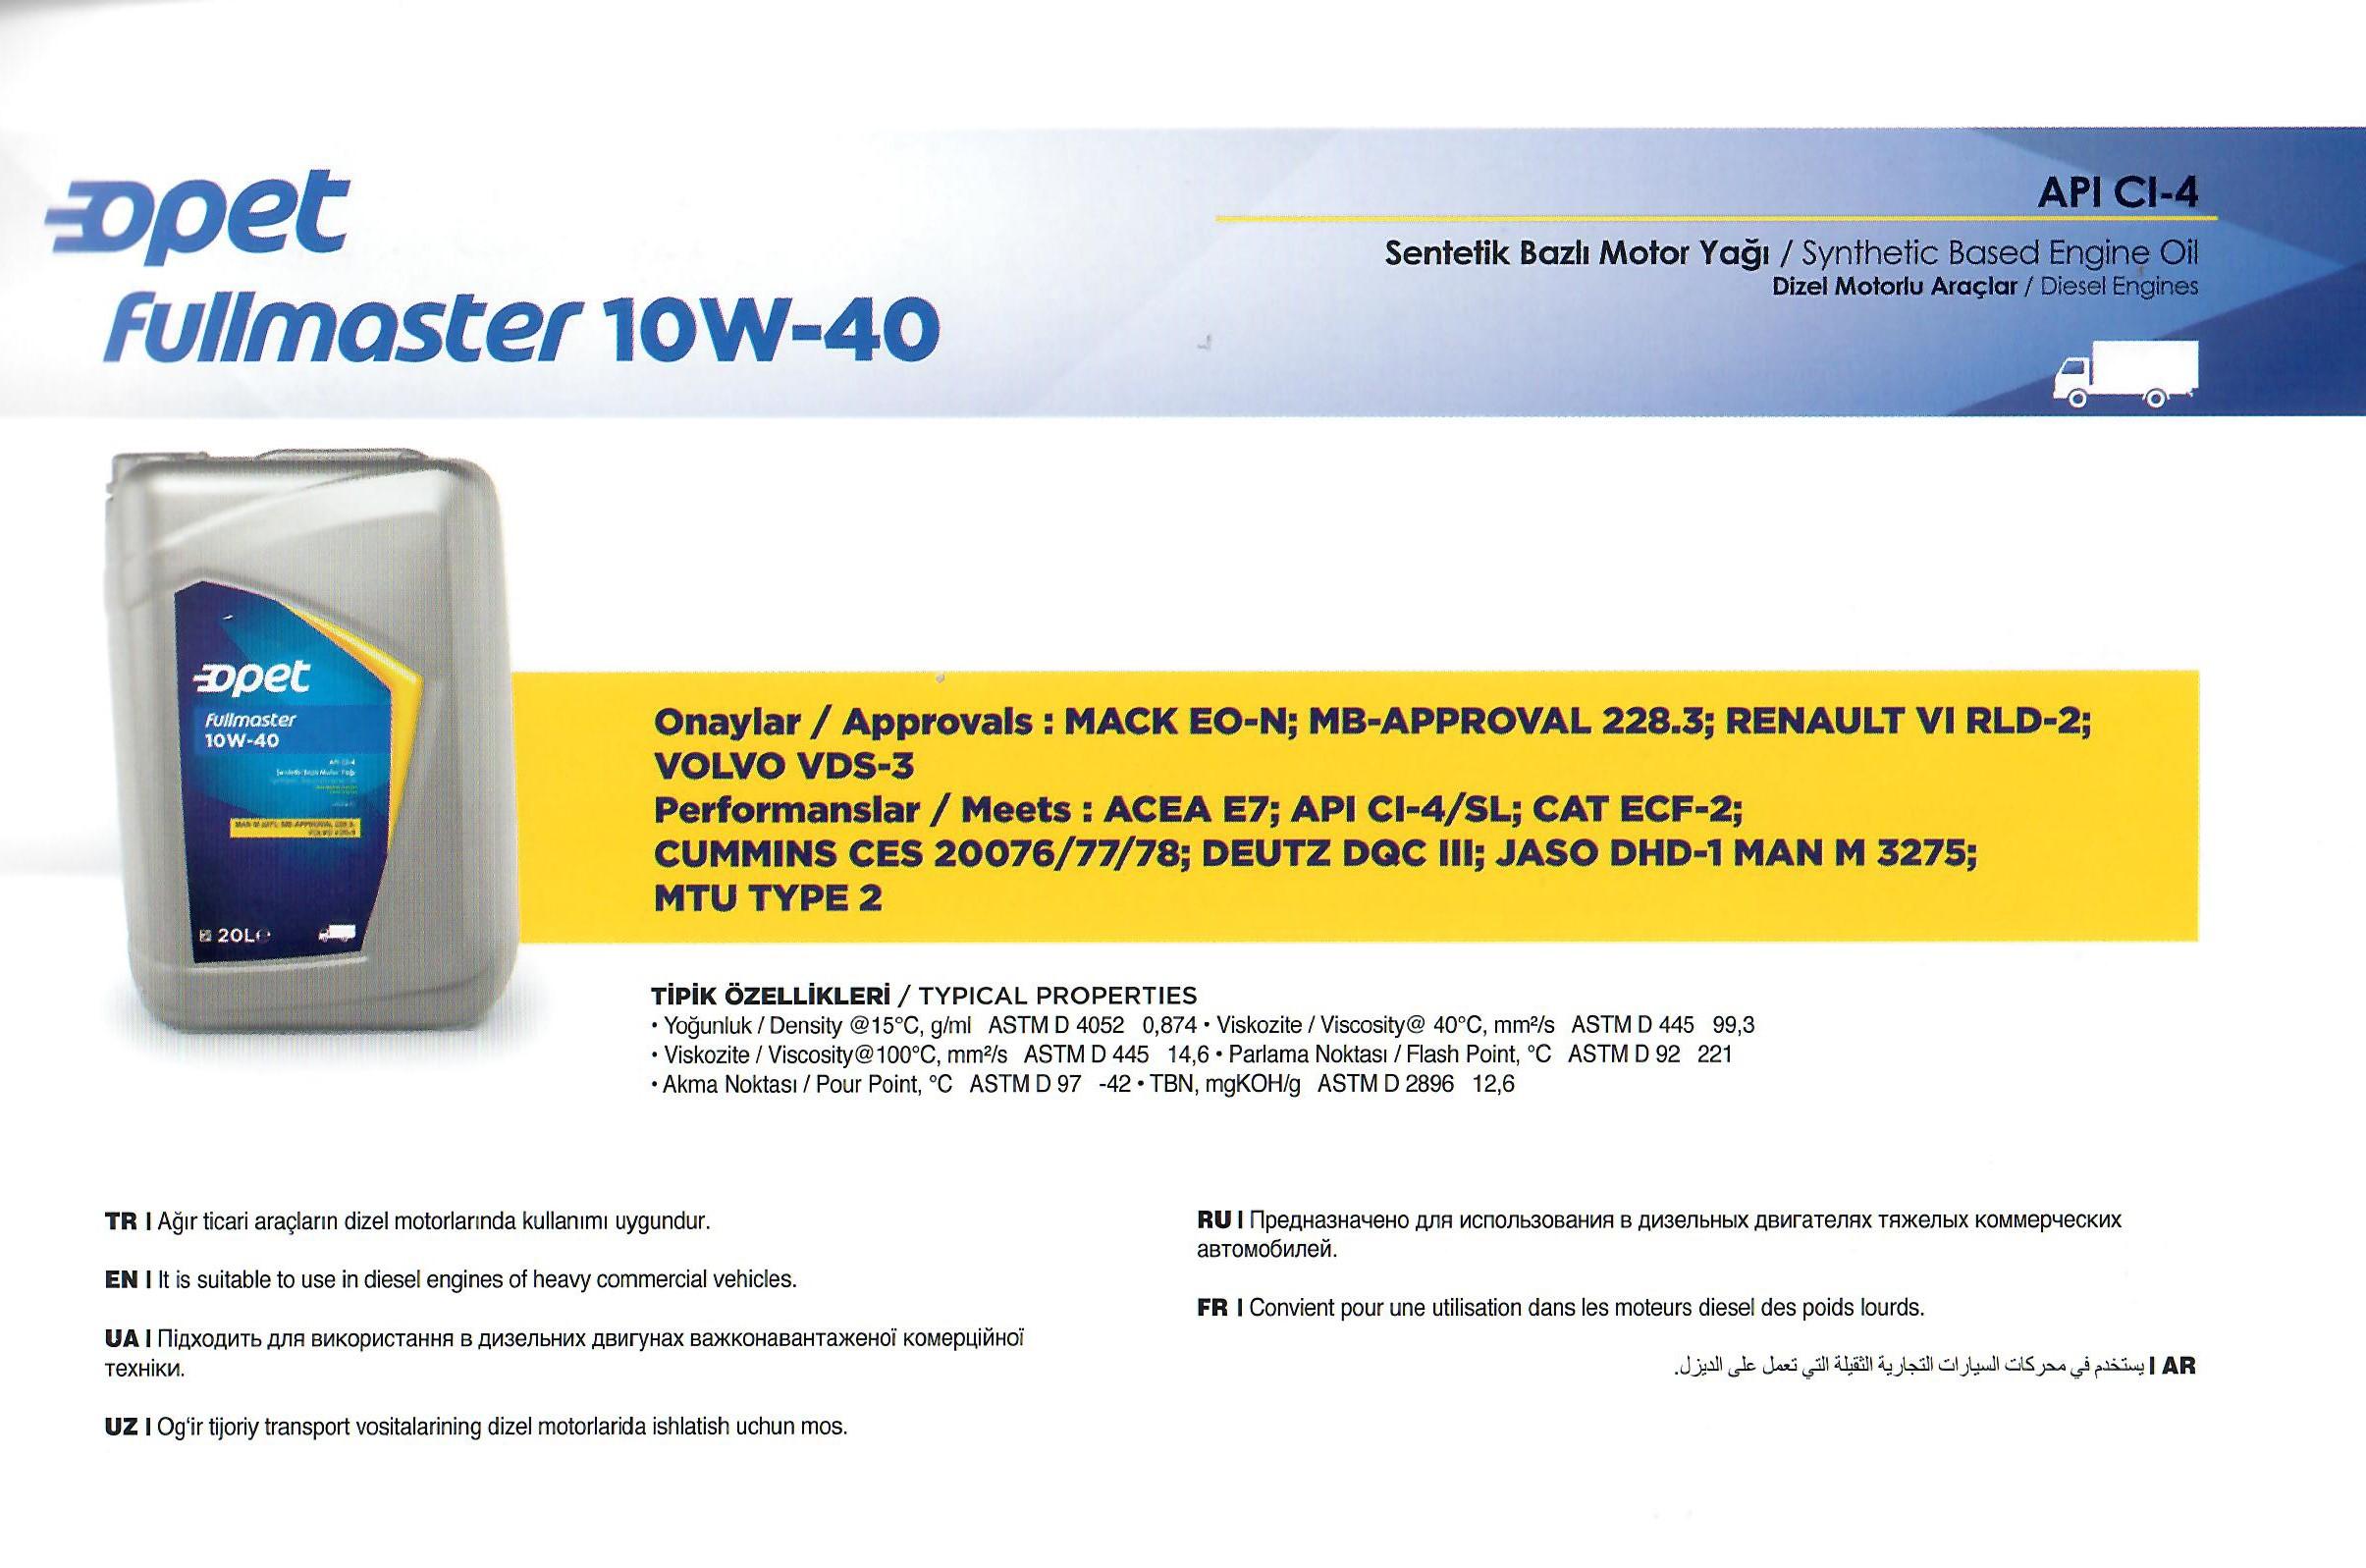 FULLMASTER 10W-40